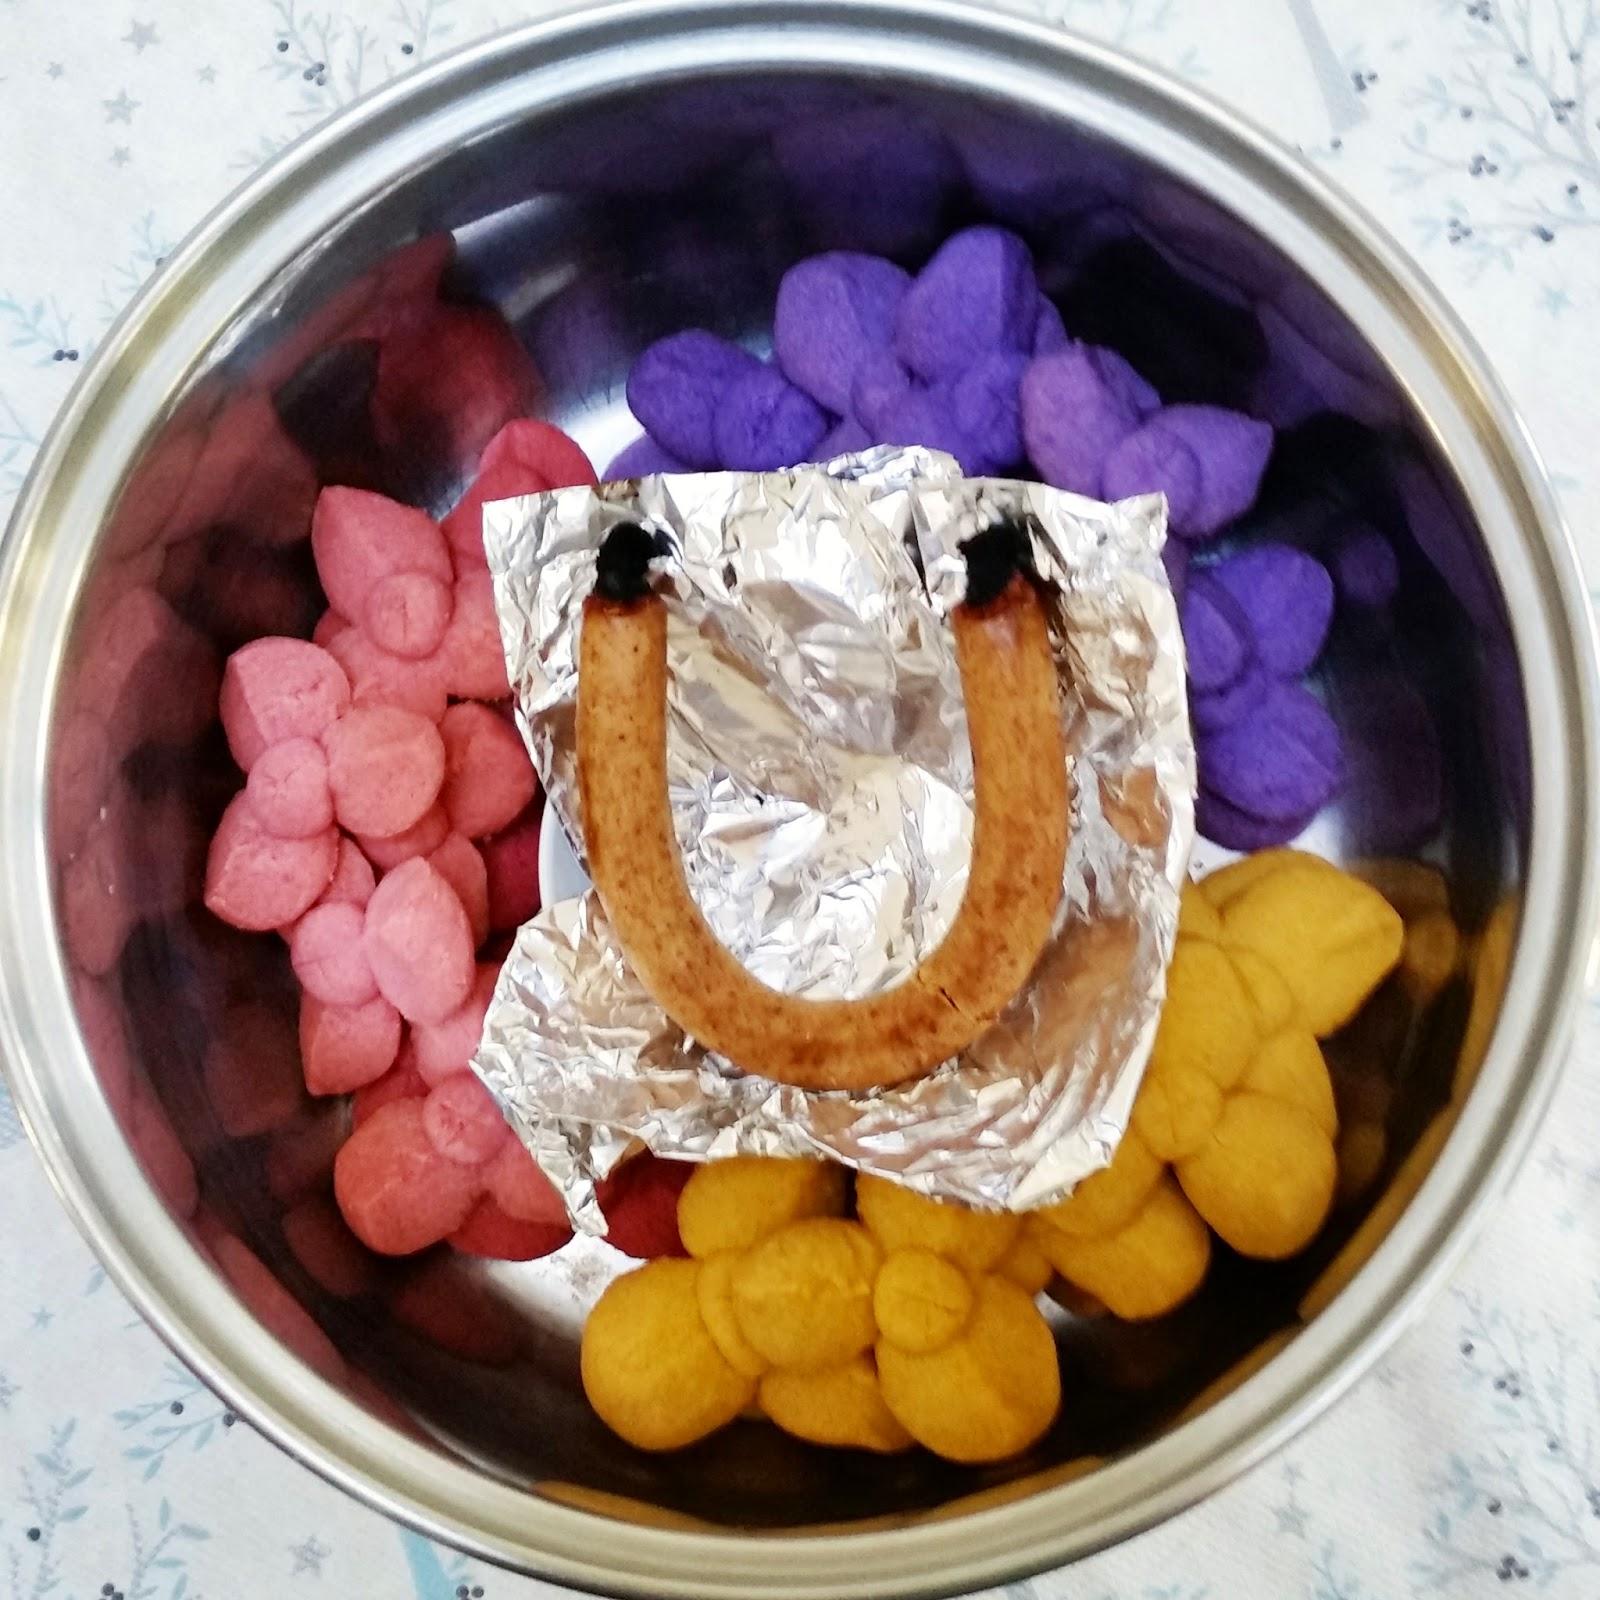 Tashcakes!: Khanom Kleeb Lamduan (Thai Shortbread)- Recipe